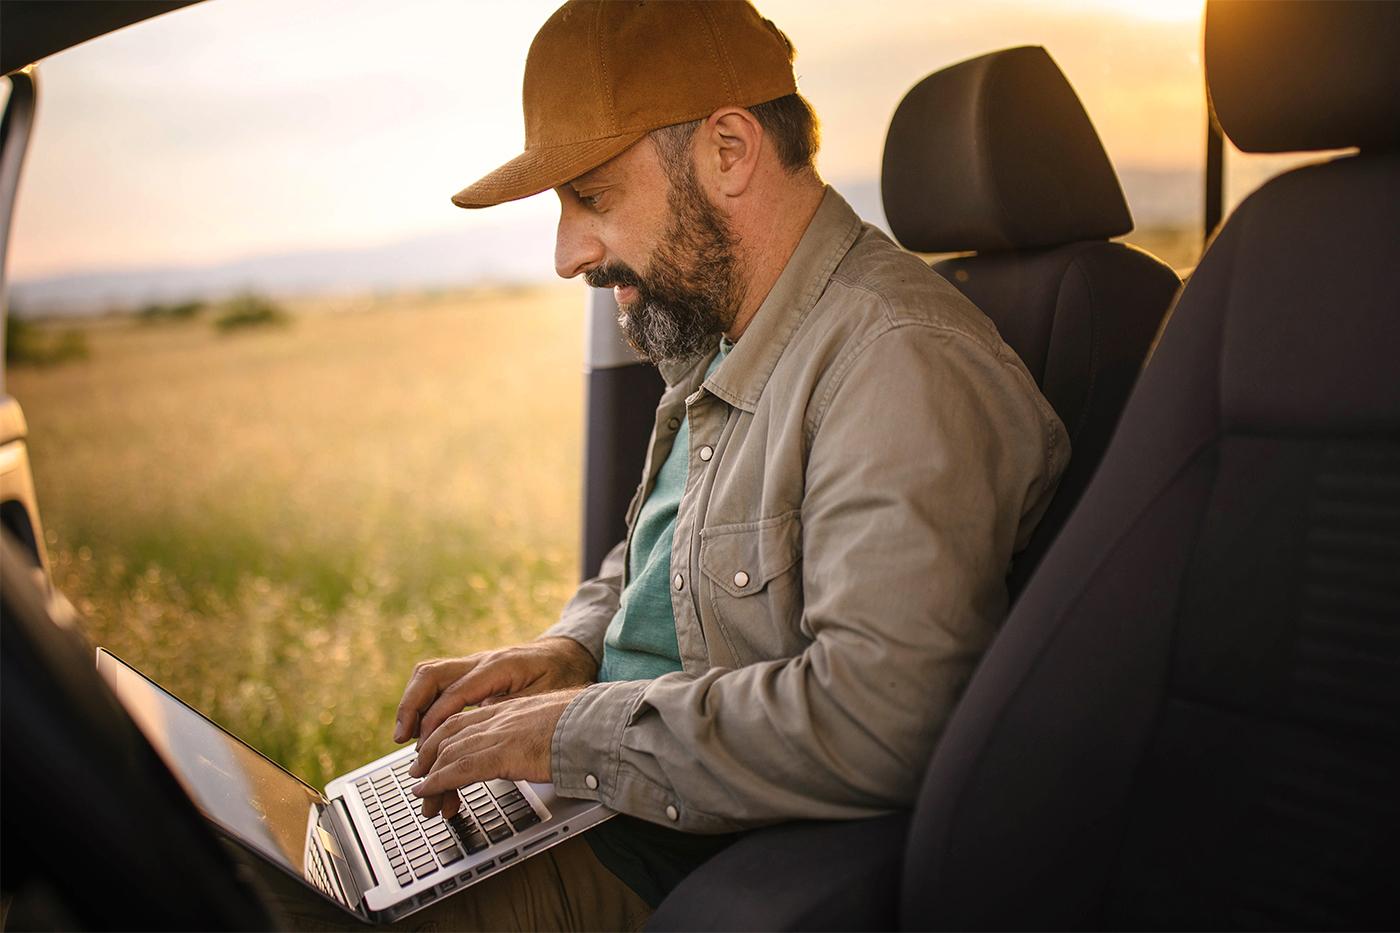 man working on laptop inside of truck